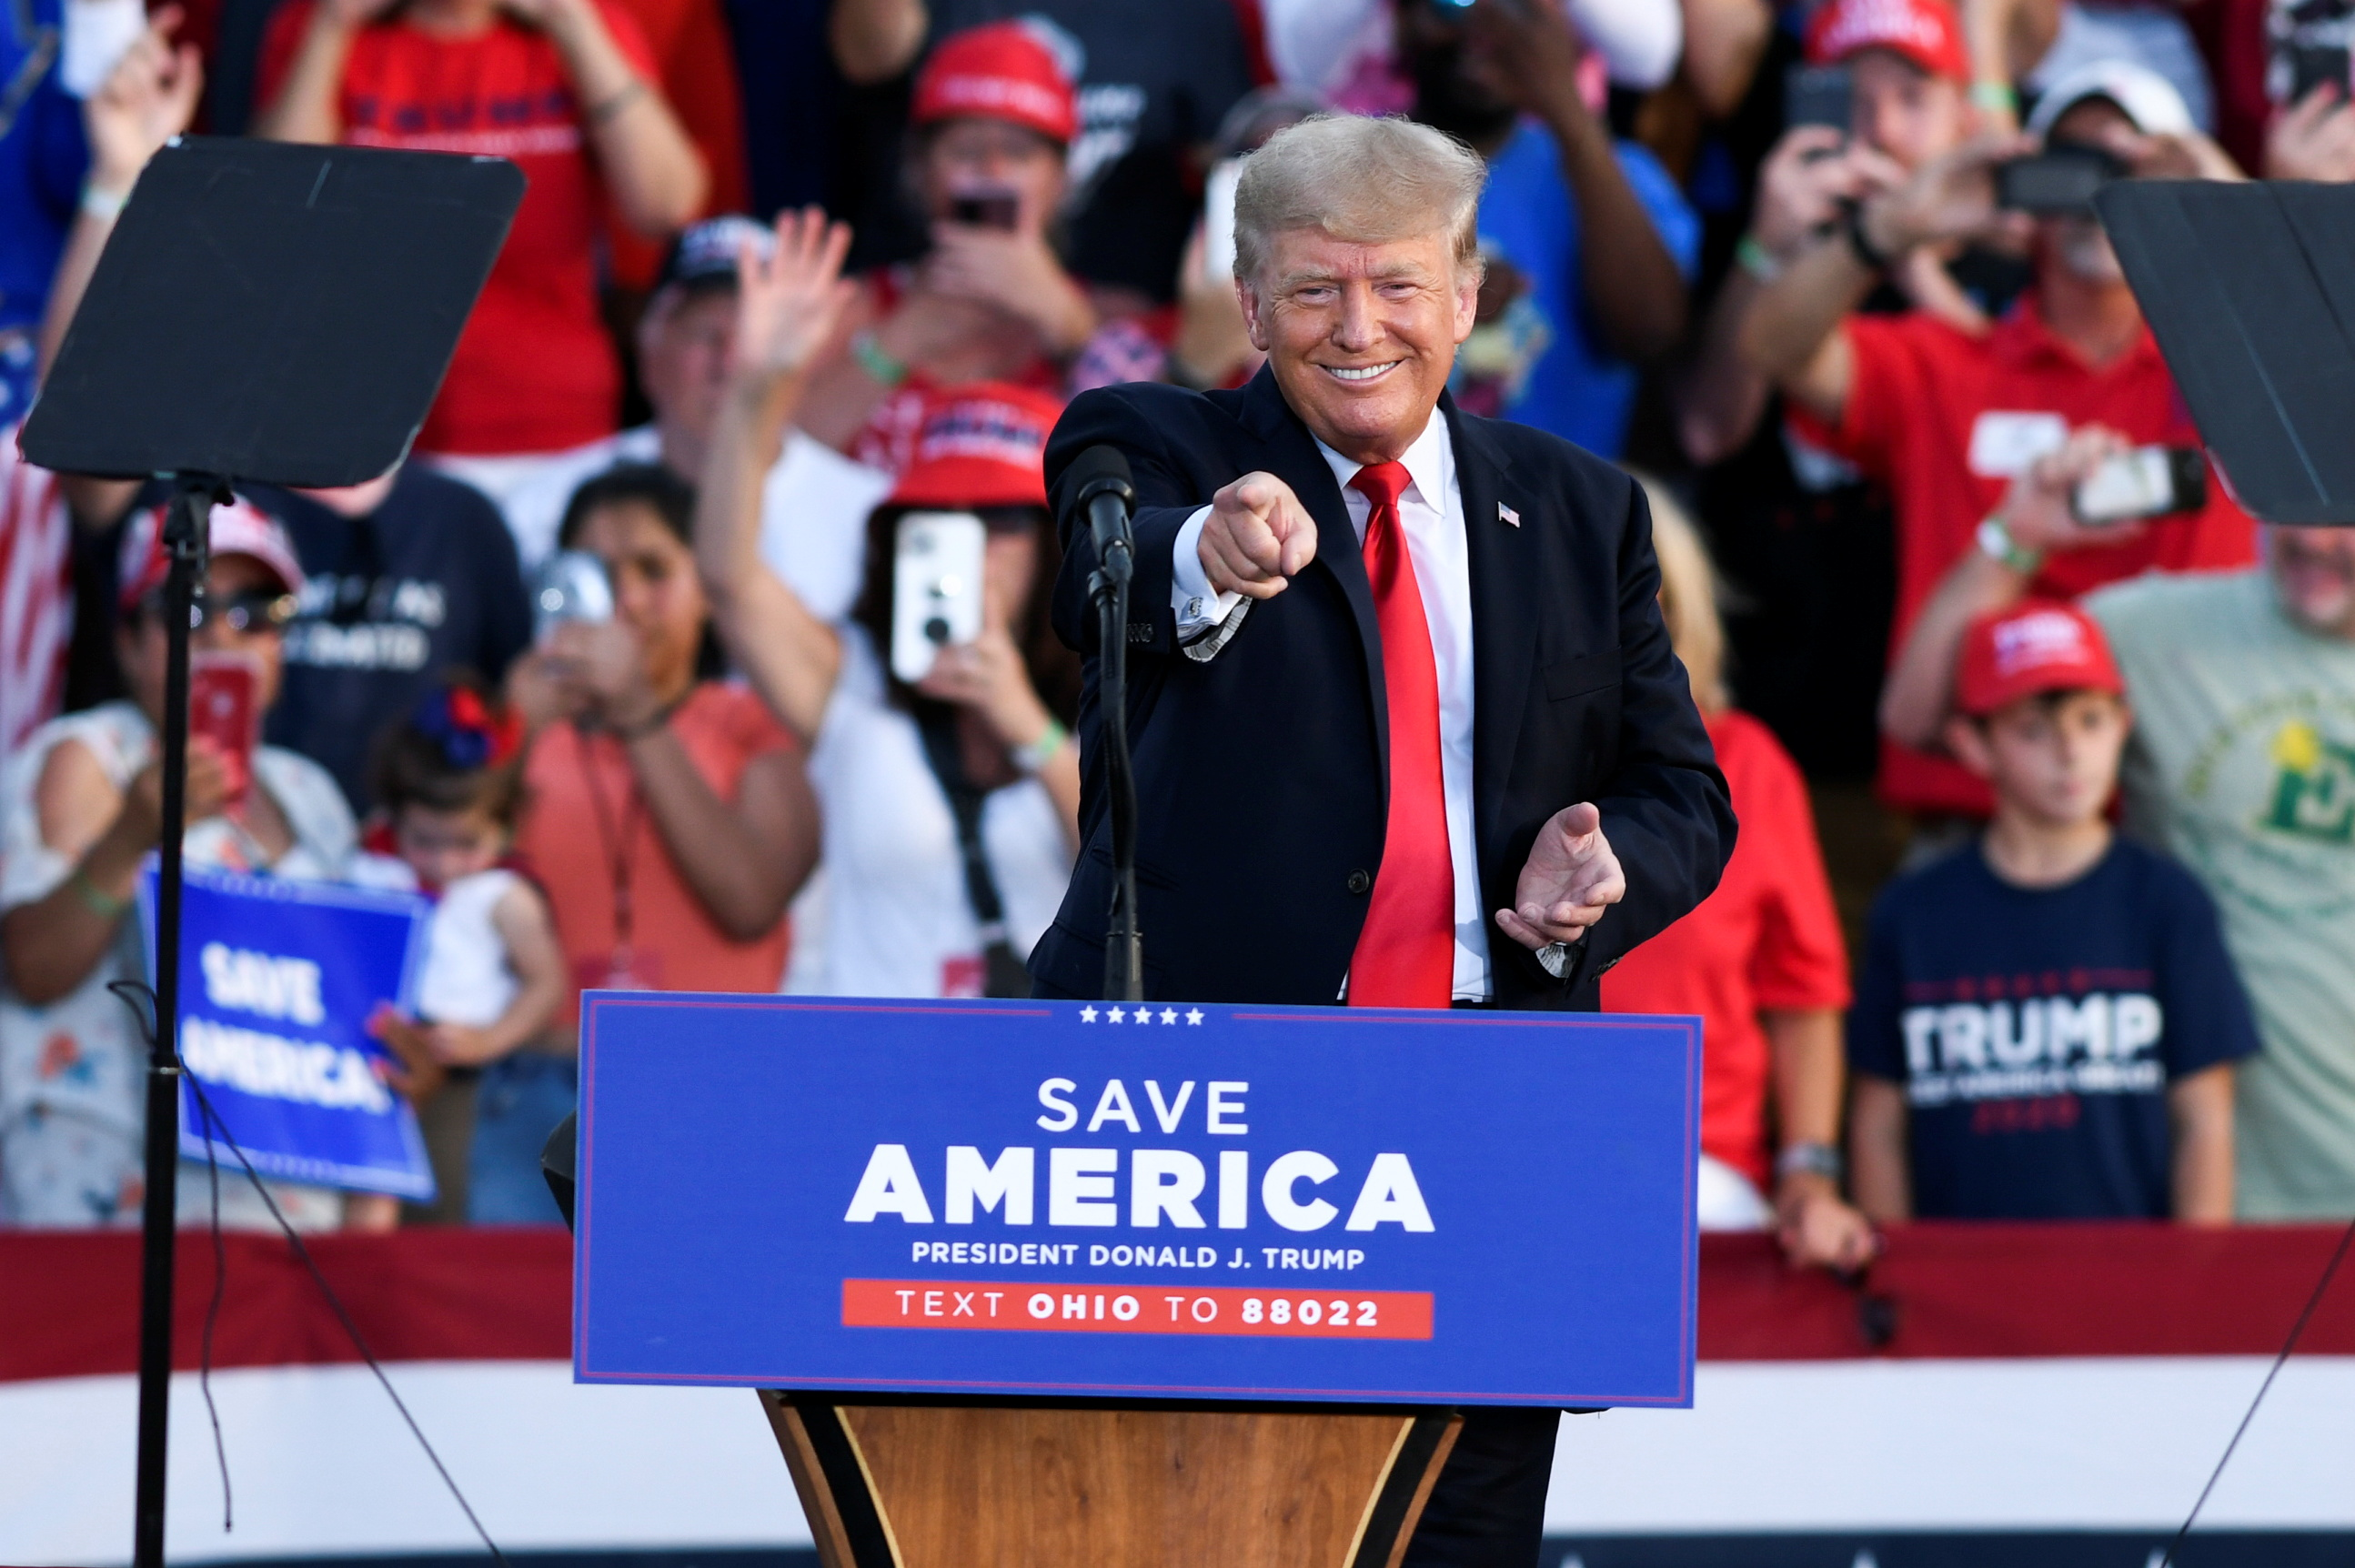 At Ohio rally, Trump knocks Biden on border, hints at 2024 plans | Reuters